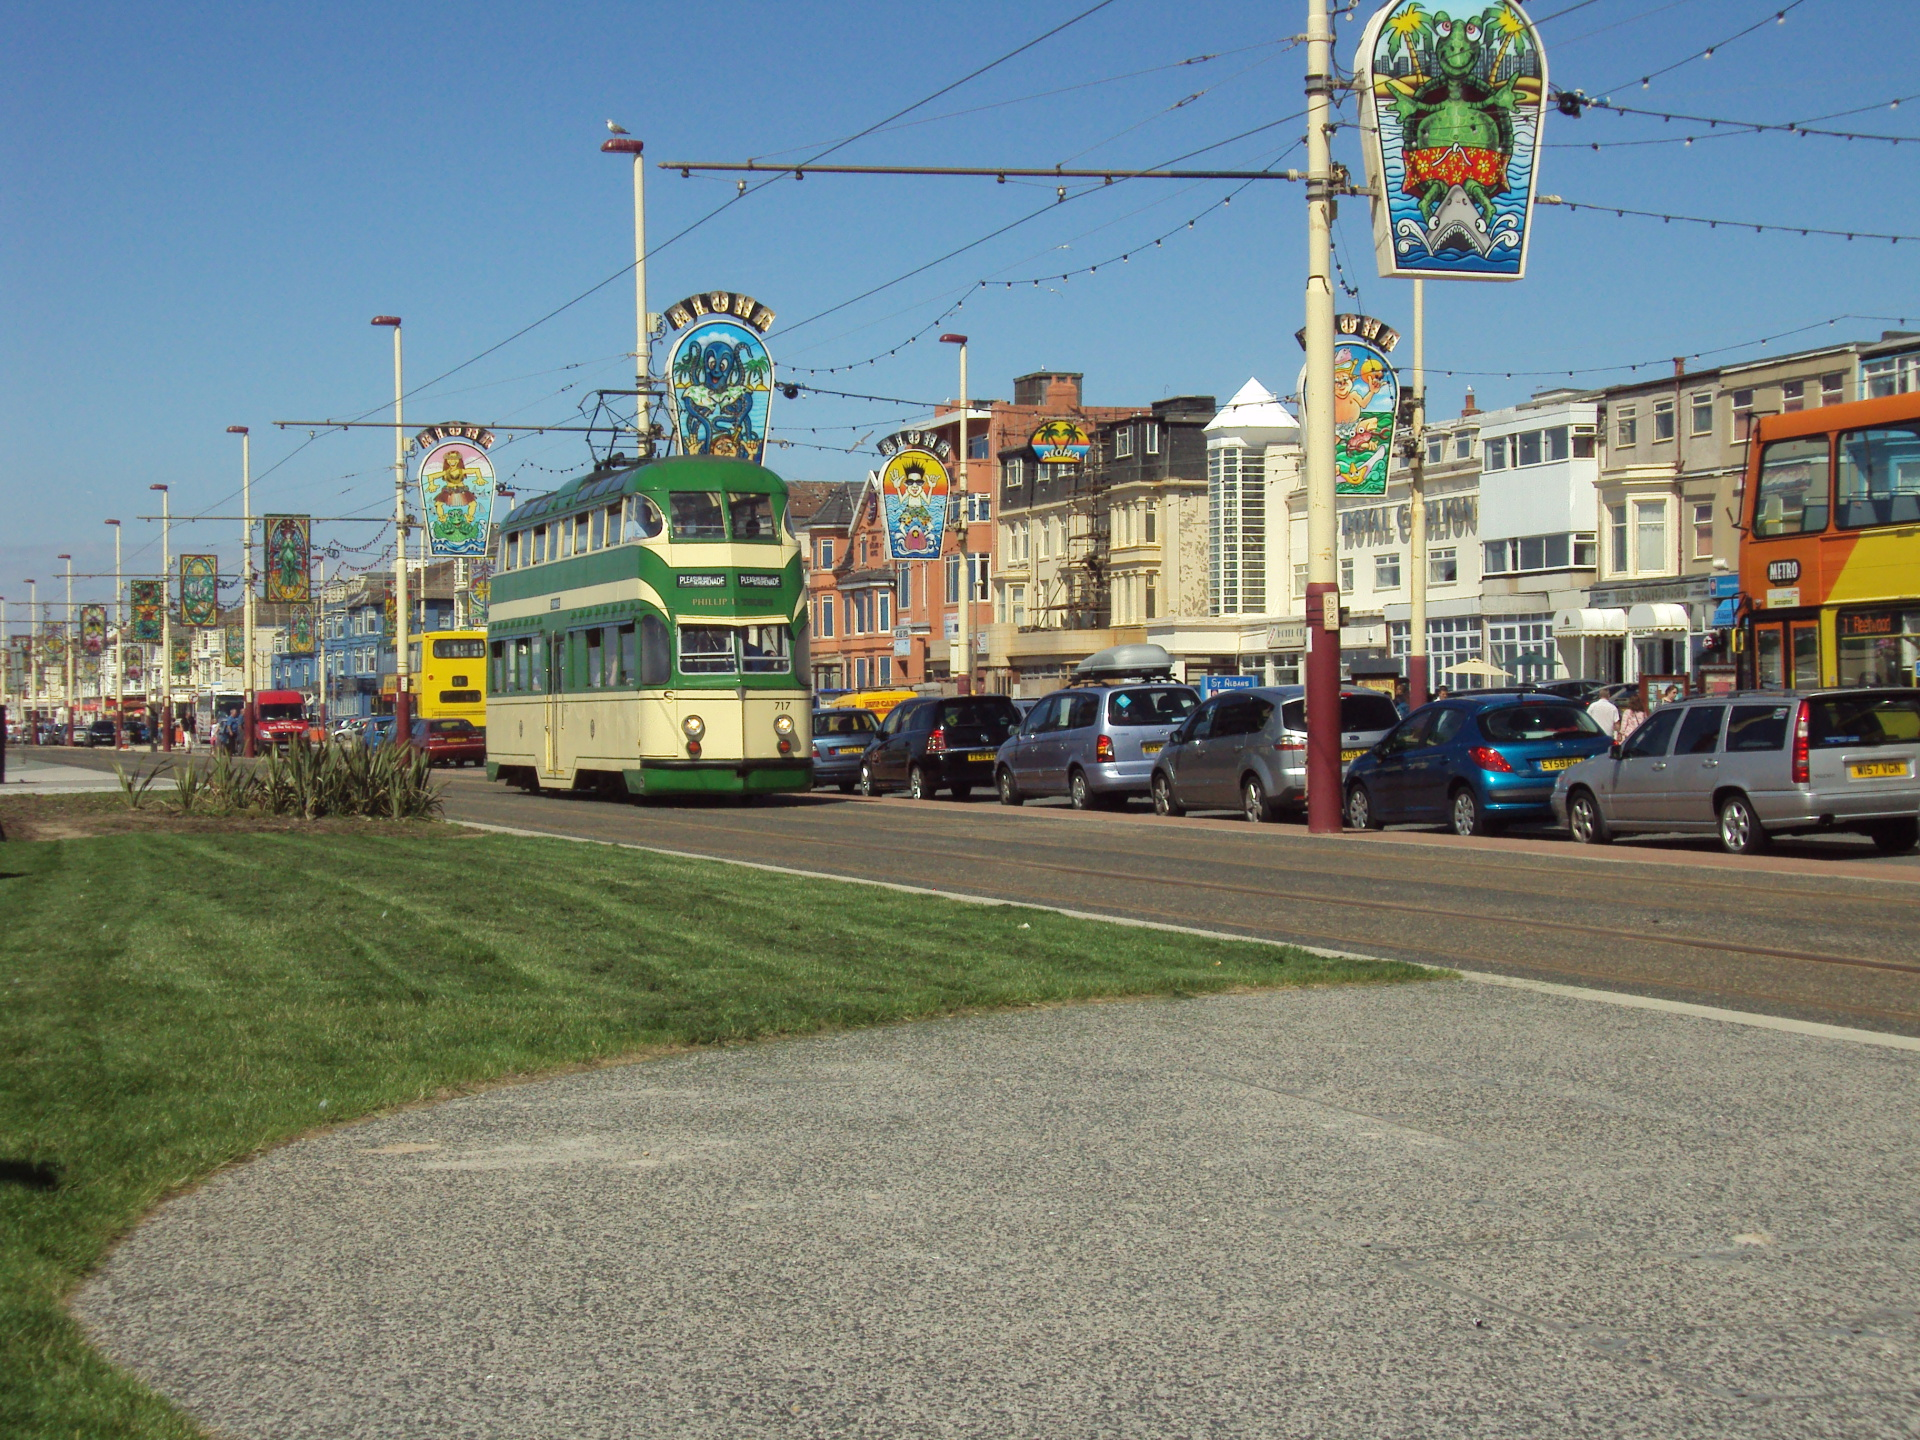 Blackpool Promenade Featuring a Blackpool Tram.